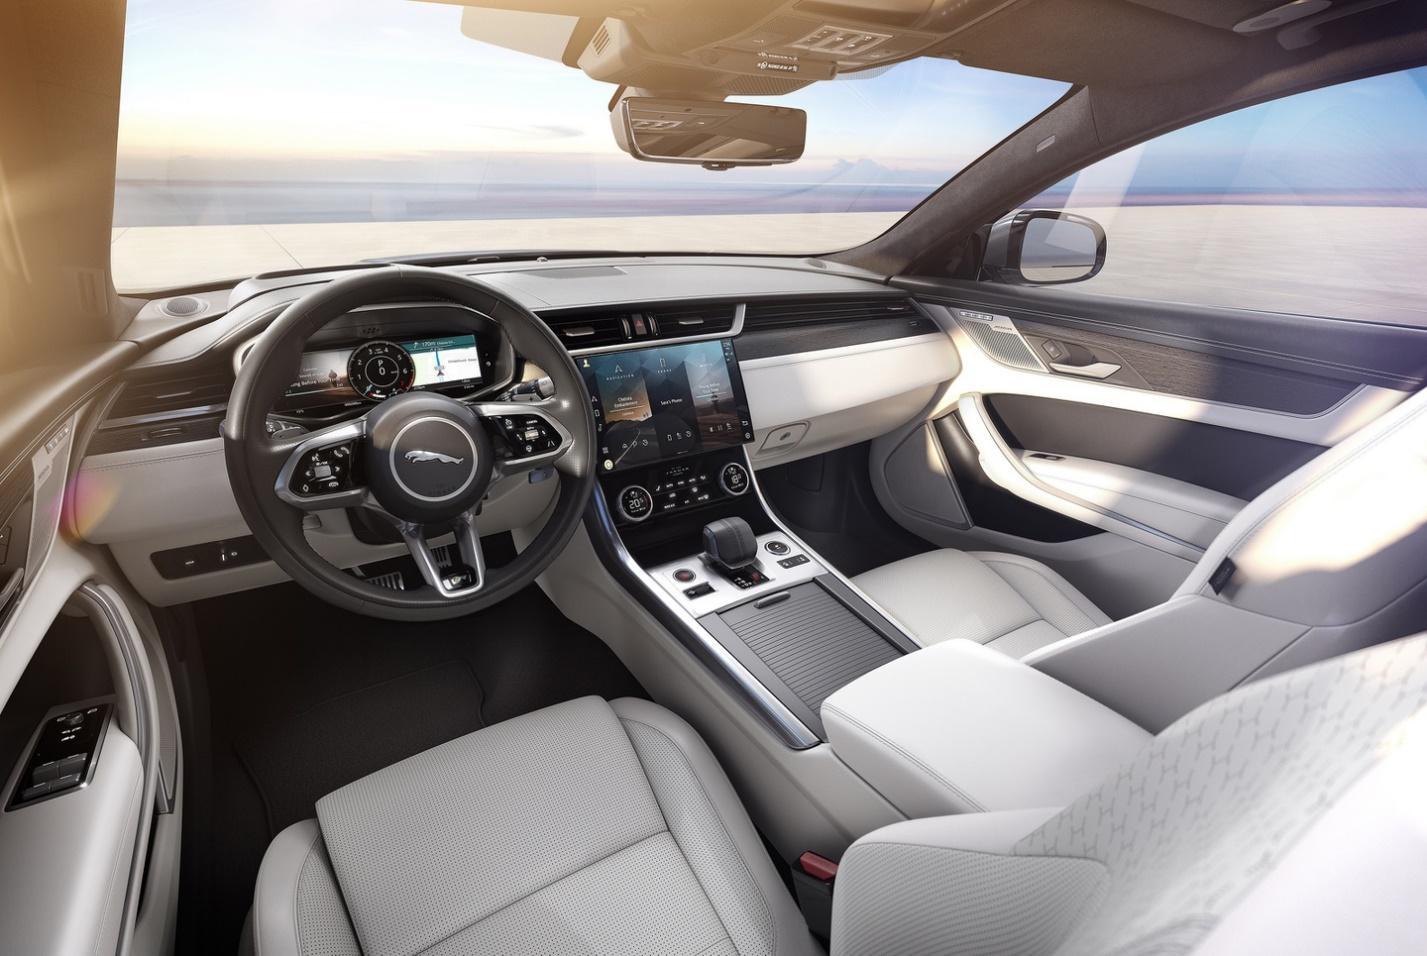 noi-that-xe-jaguar-xf-2021-muaxegiatot-vn-6